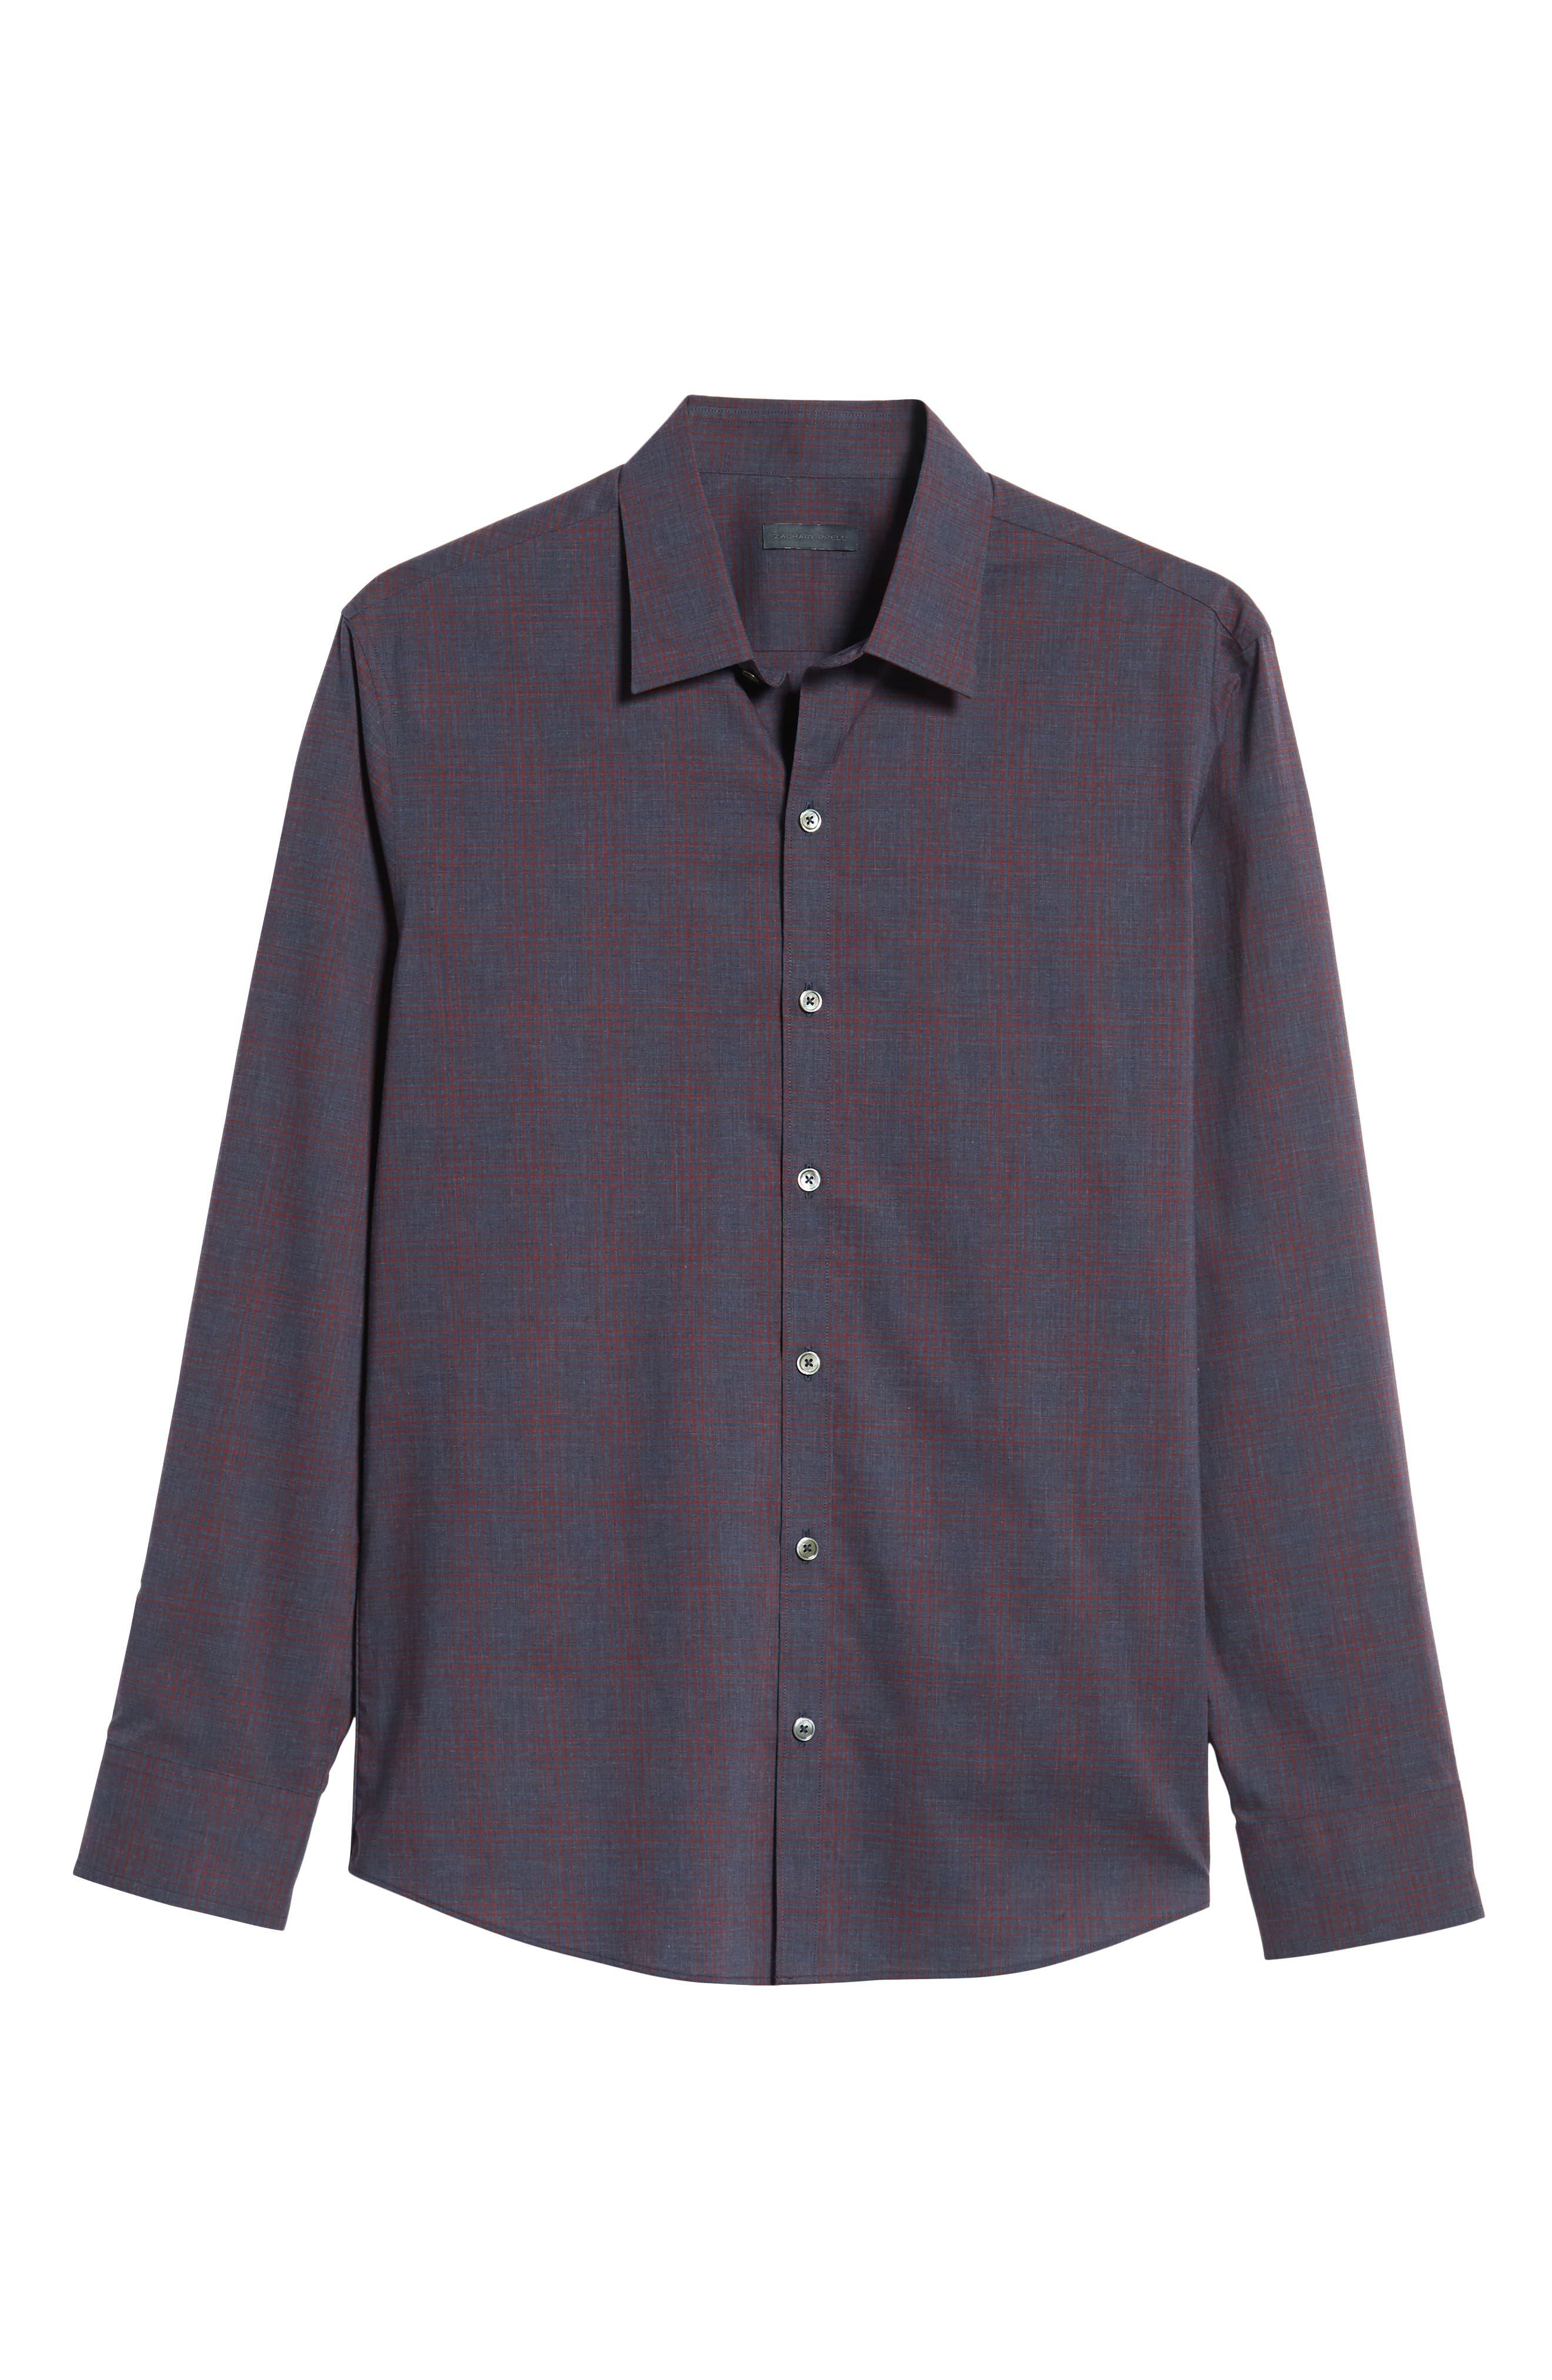 ZACHARY PRELL,                             Maslin Regular Fit Sport Shirt,                             Alternate thumbnail 5, color,                             461